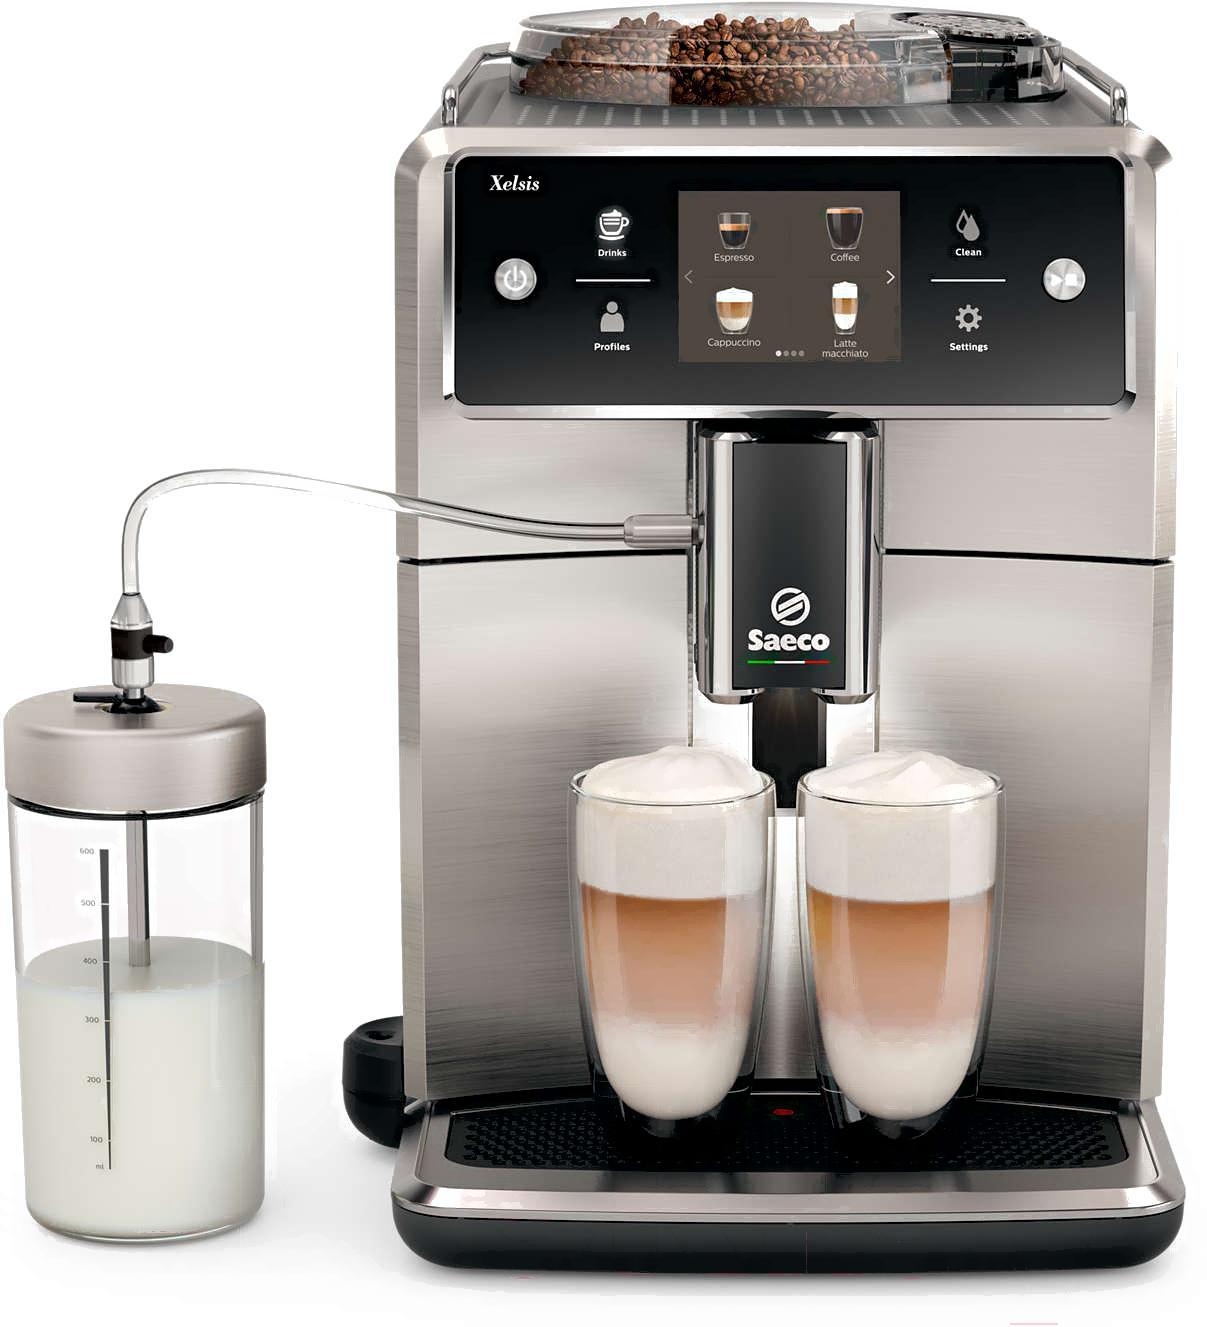 Кофеварка / кофемашина Saeco Xelsis SM7685/00